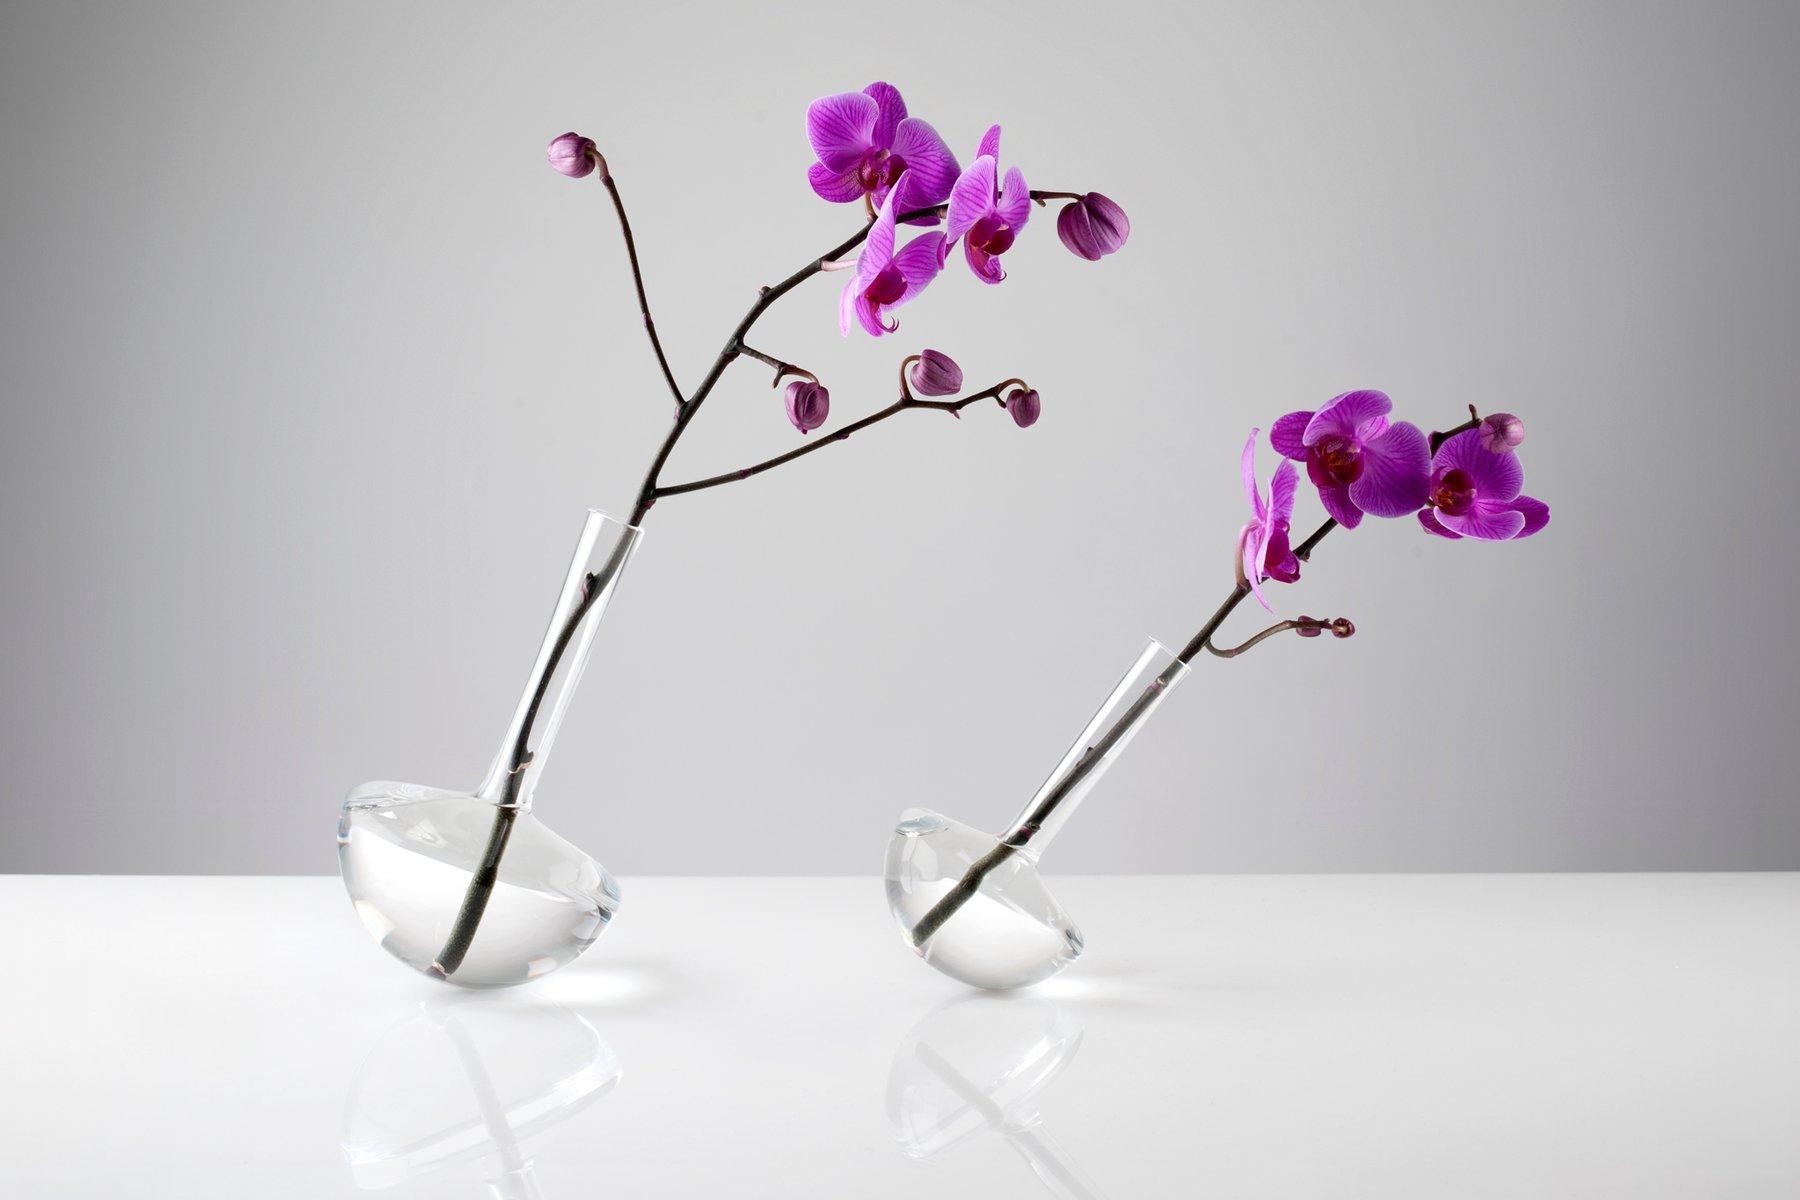 gauge klarglas vase f r einzelne blume von jim rokos f r giant mountains of bohemia glassworks. Black Bedroom Furniture Sets. Home Design Ideas